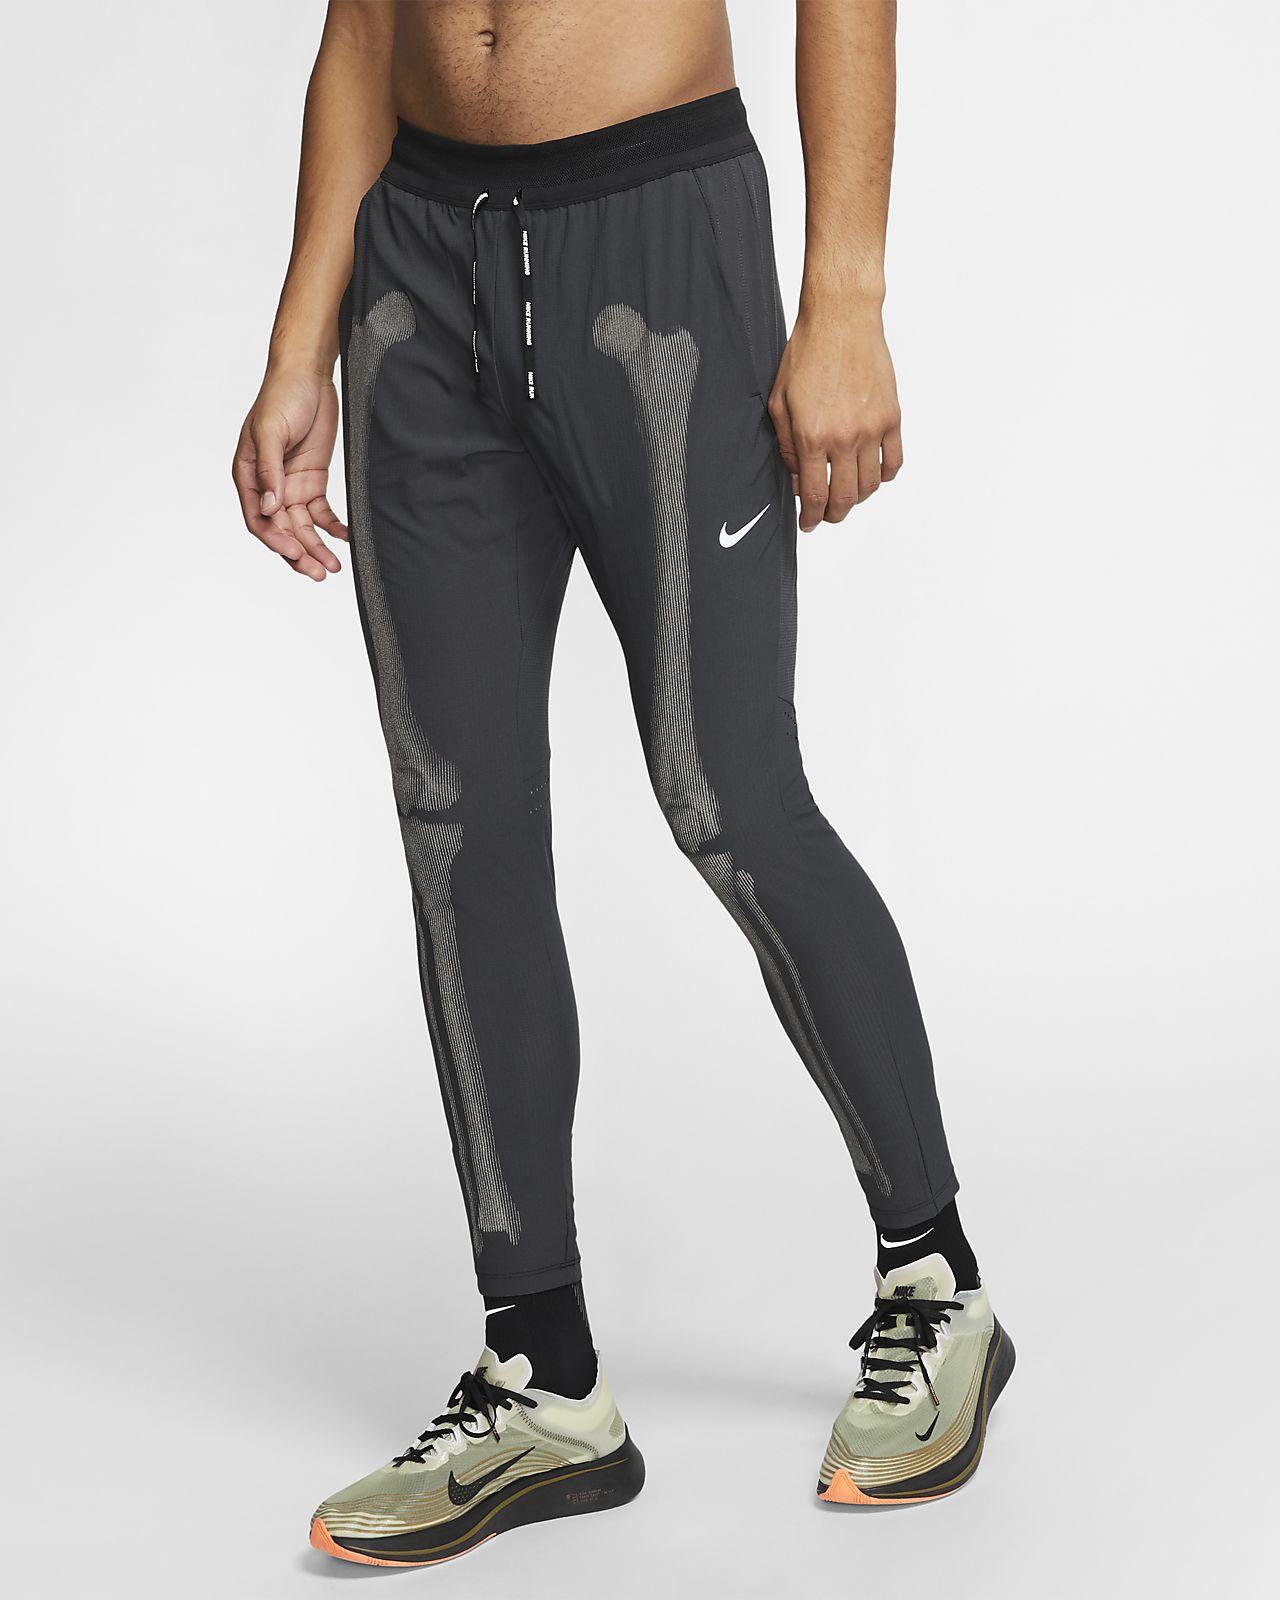 Nike 男款 Skeleton 運動褲